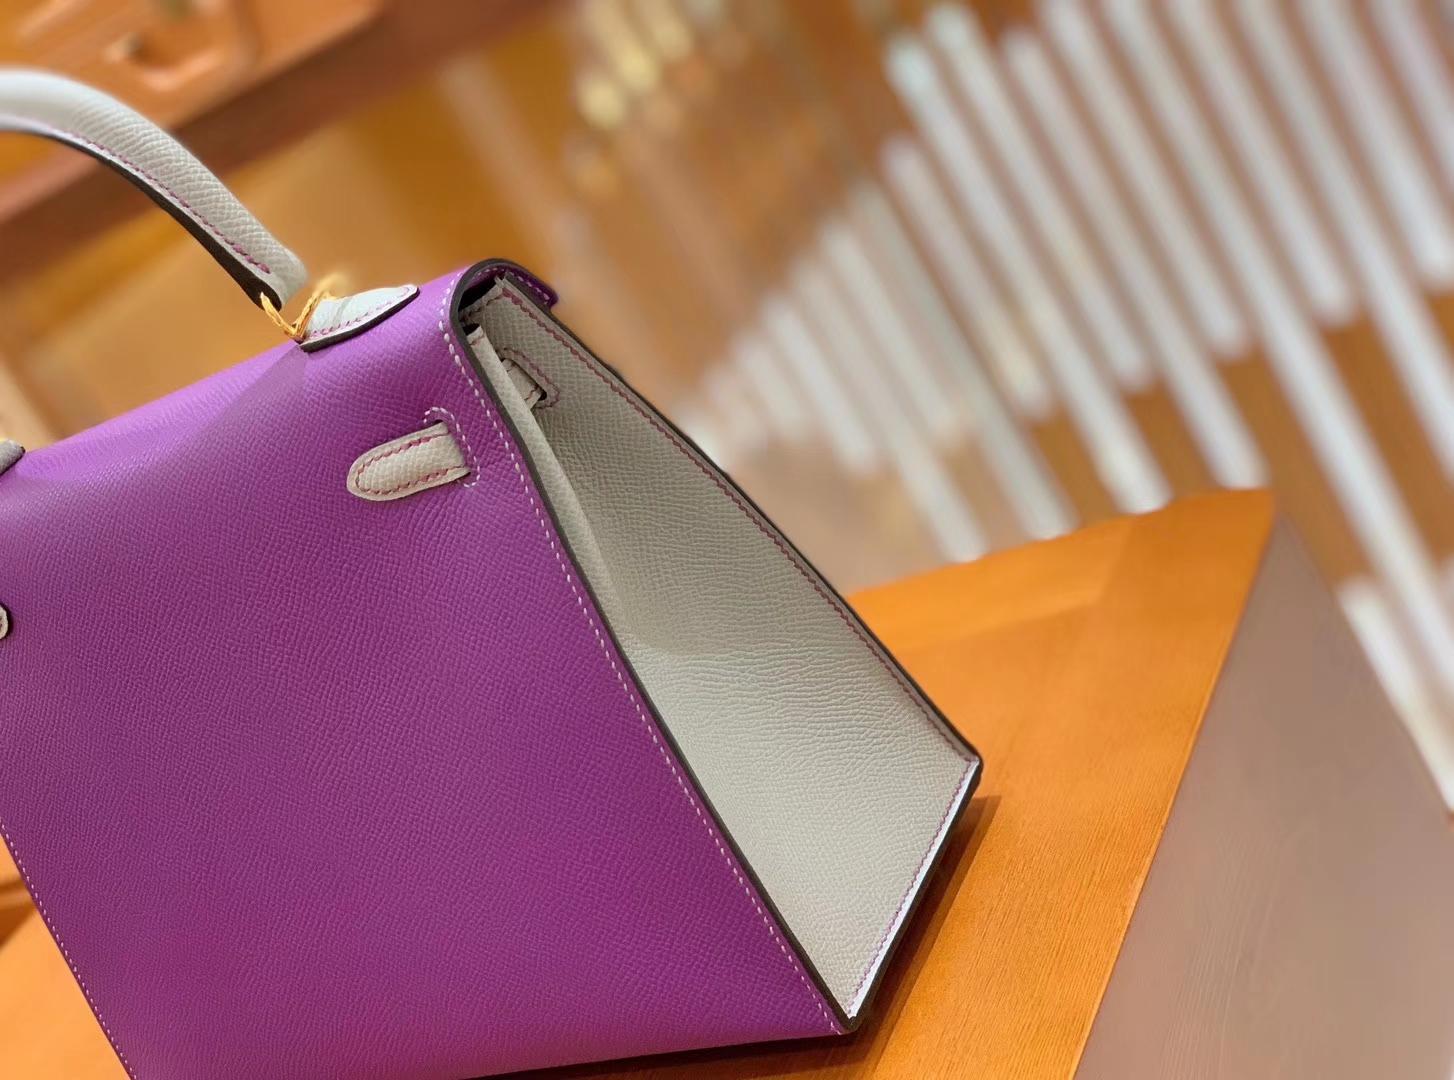 Hermès(爱马仕)Kelly 凯莉包 海葵紫拼海鸥灰 掌纹德国进口牛皮 全手工 金扣 25cm 现货